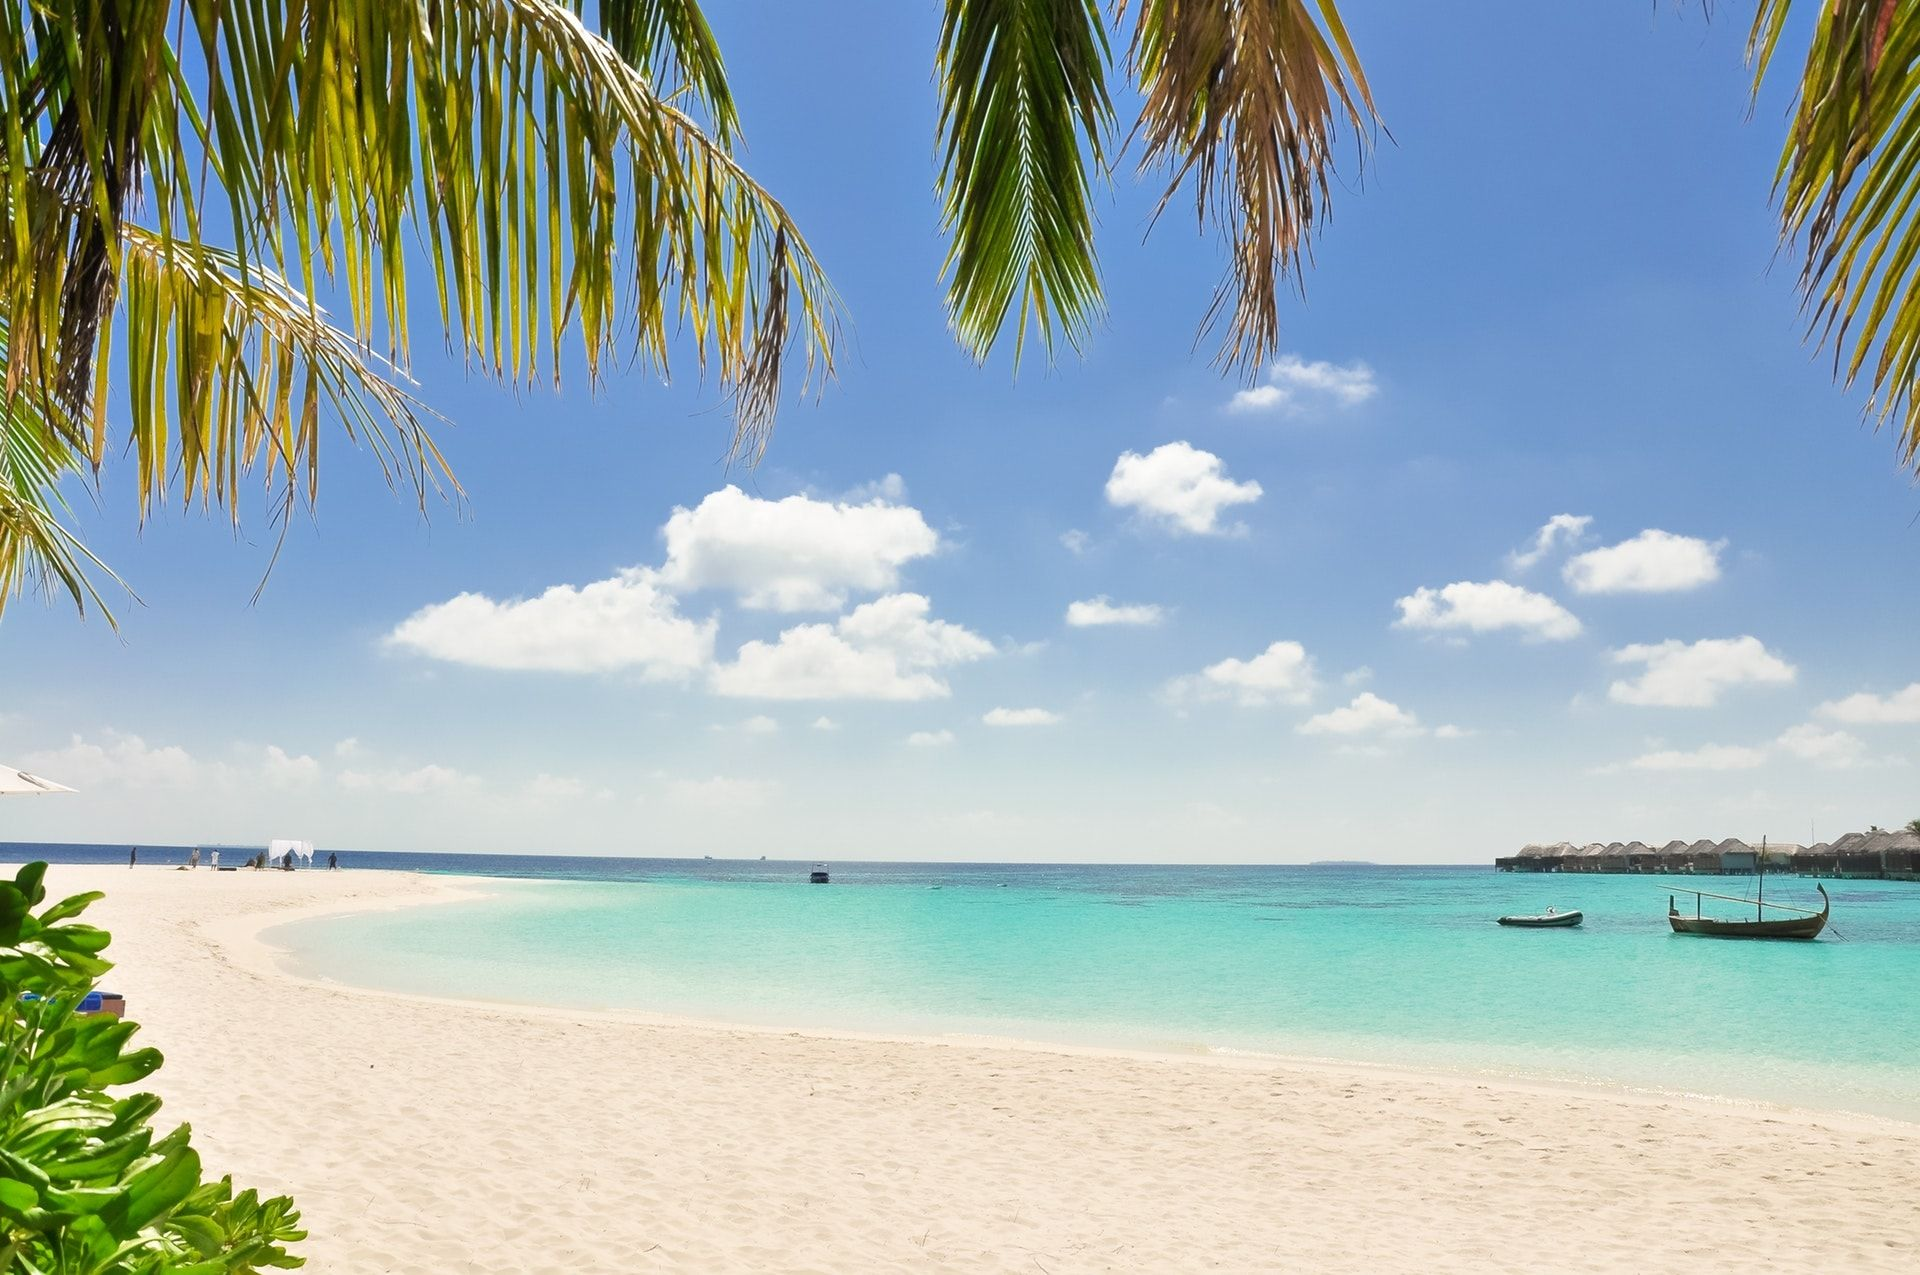 13 Gambar Pemandangan Pantai Yang Indah Dipandang